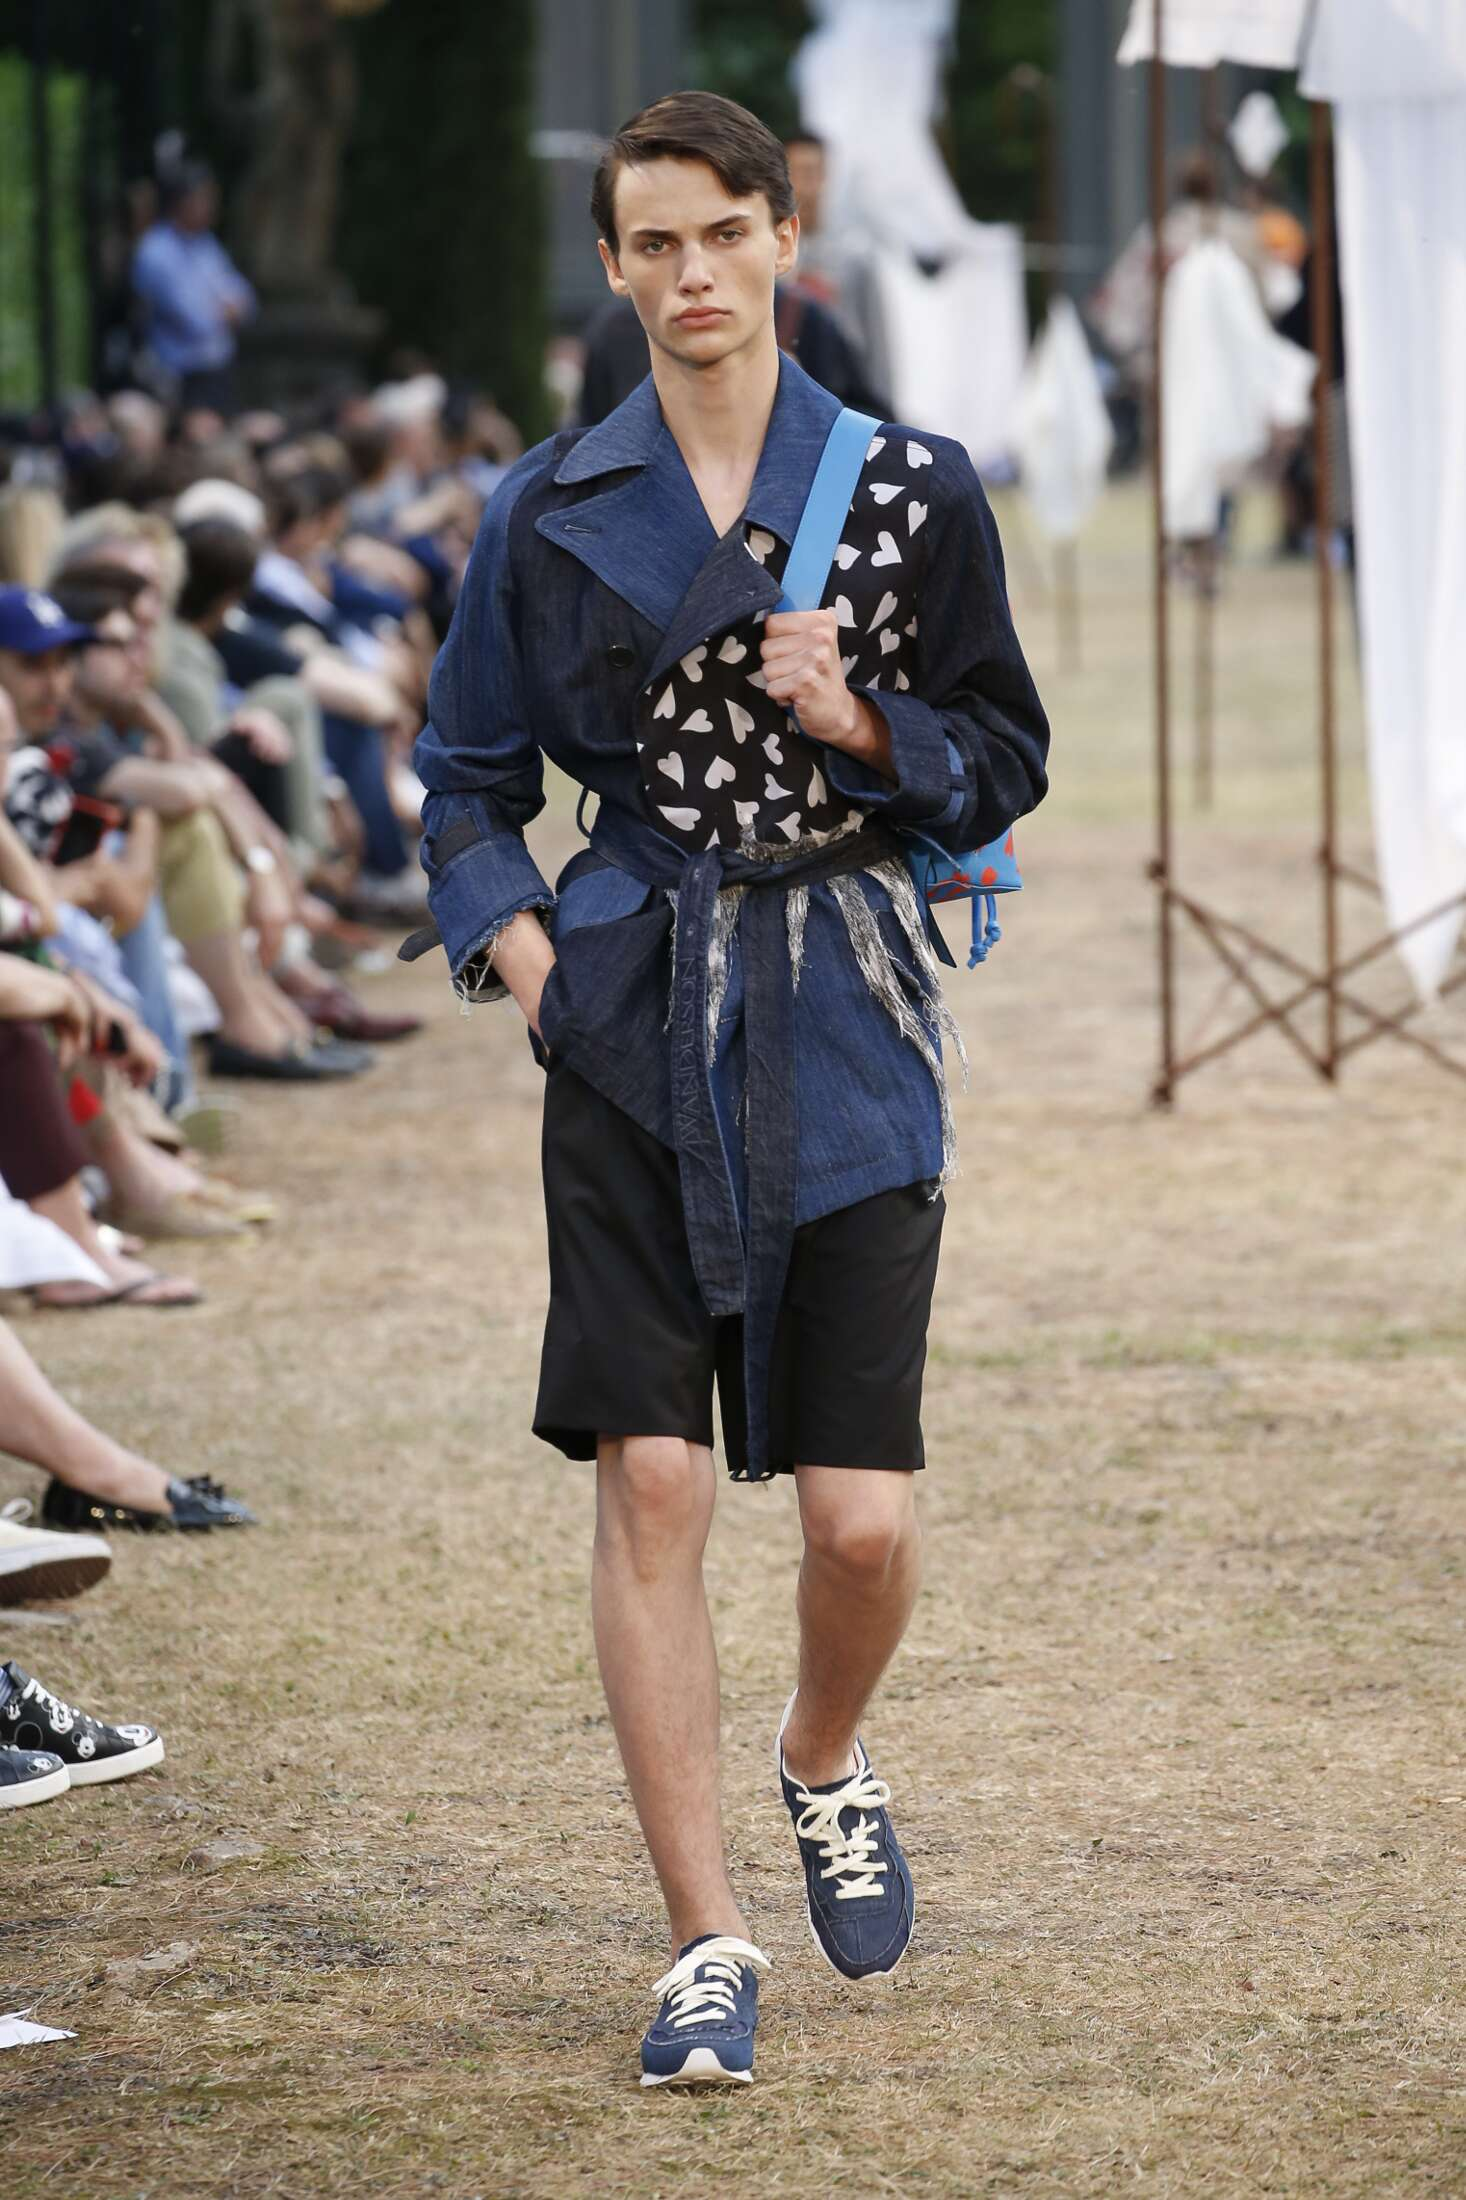 2018 Catwalk J.W. Anderson Man Fashion Show Summer